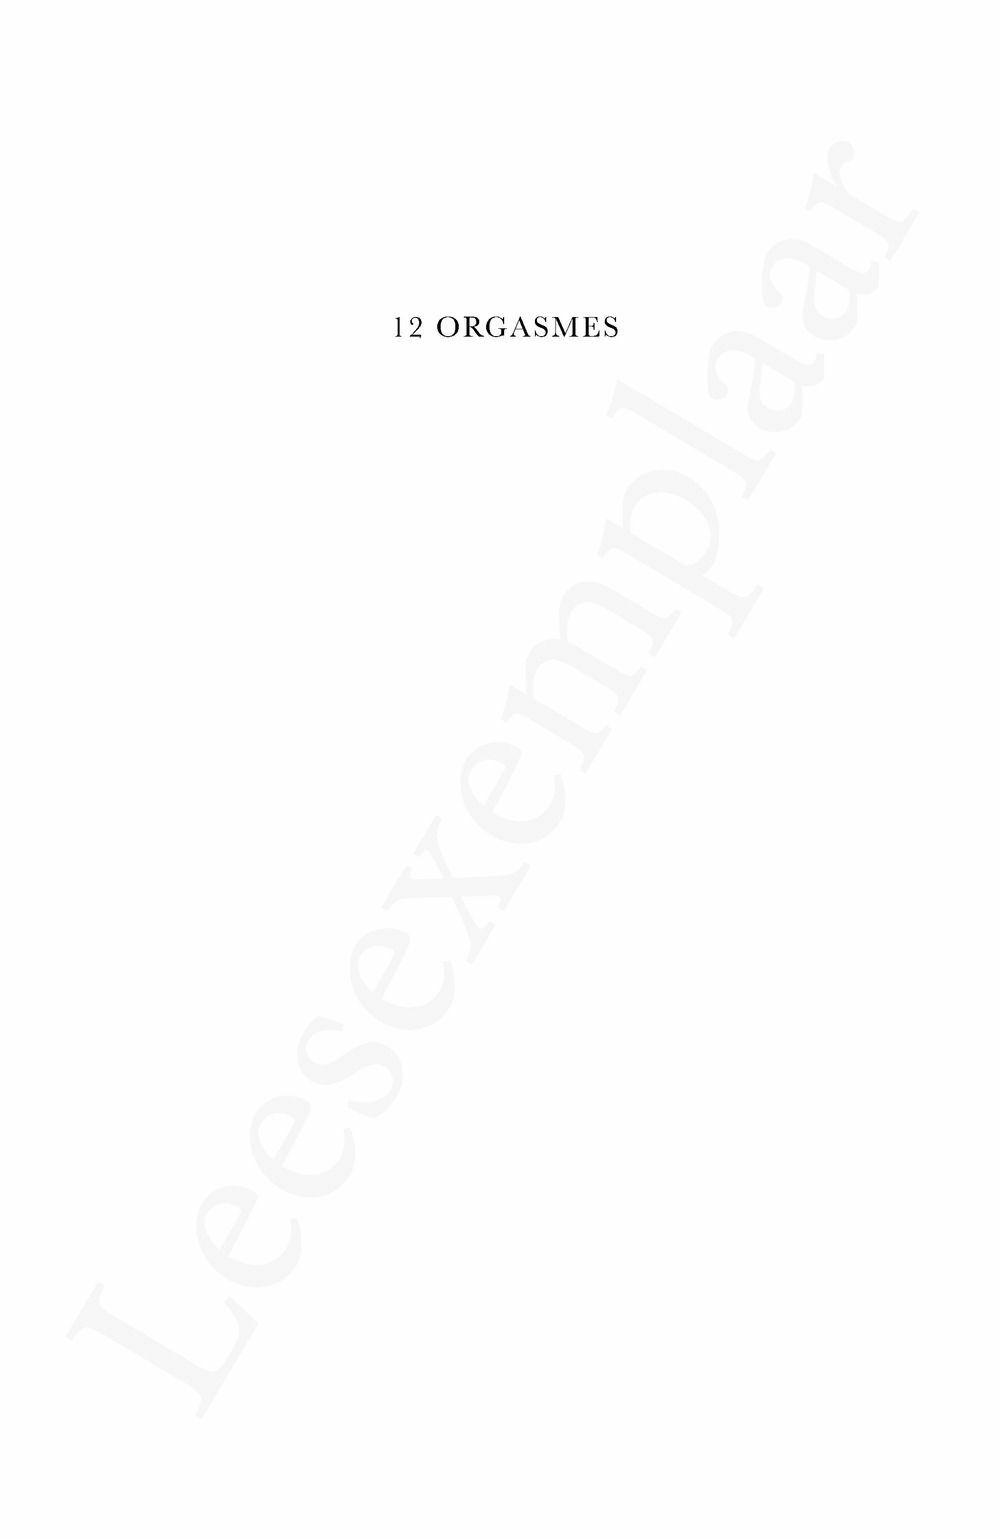 Preview: 12 orgasmes